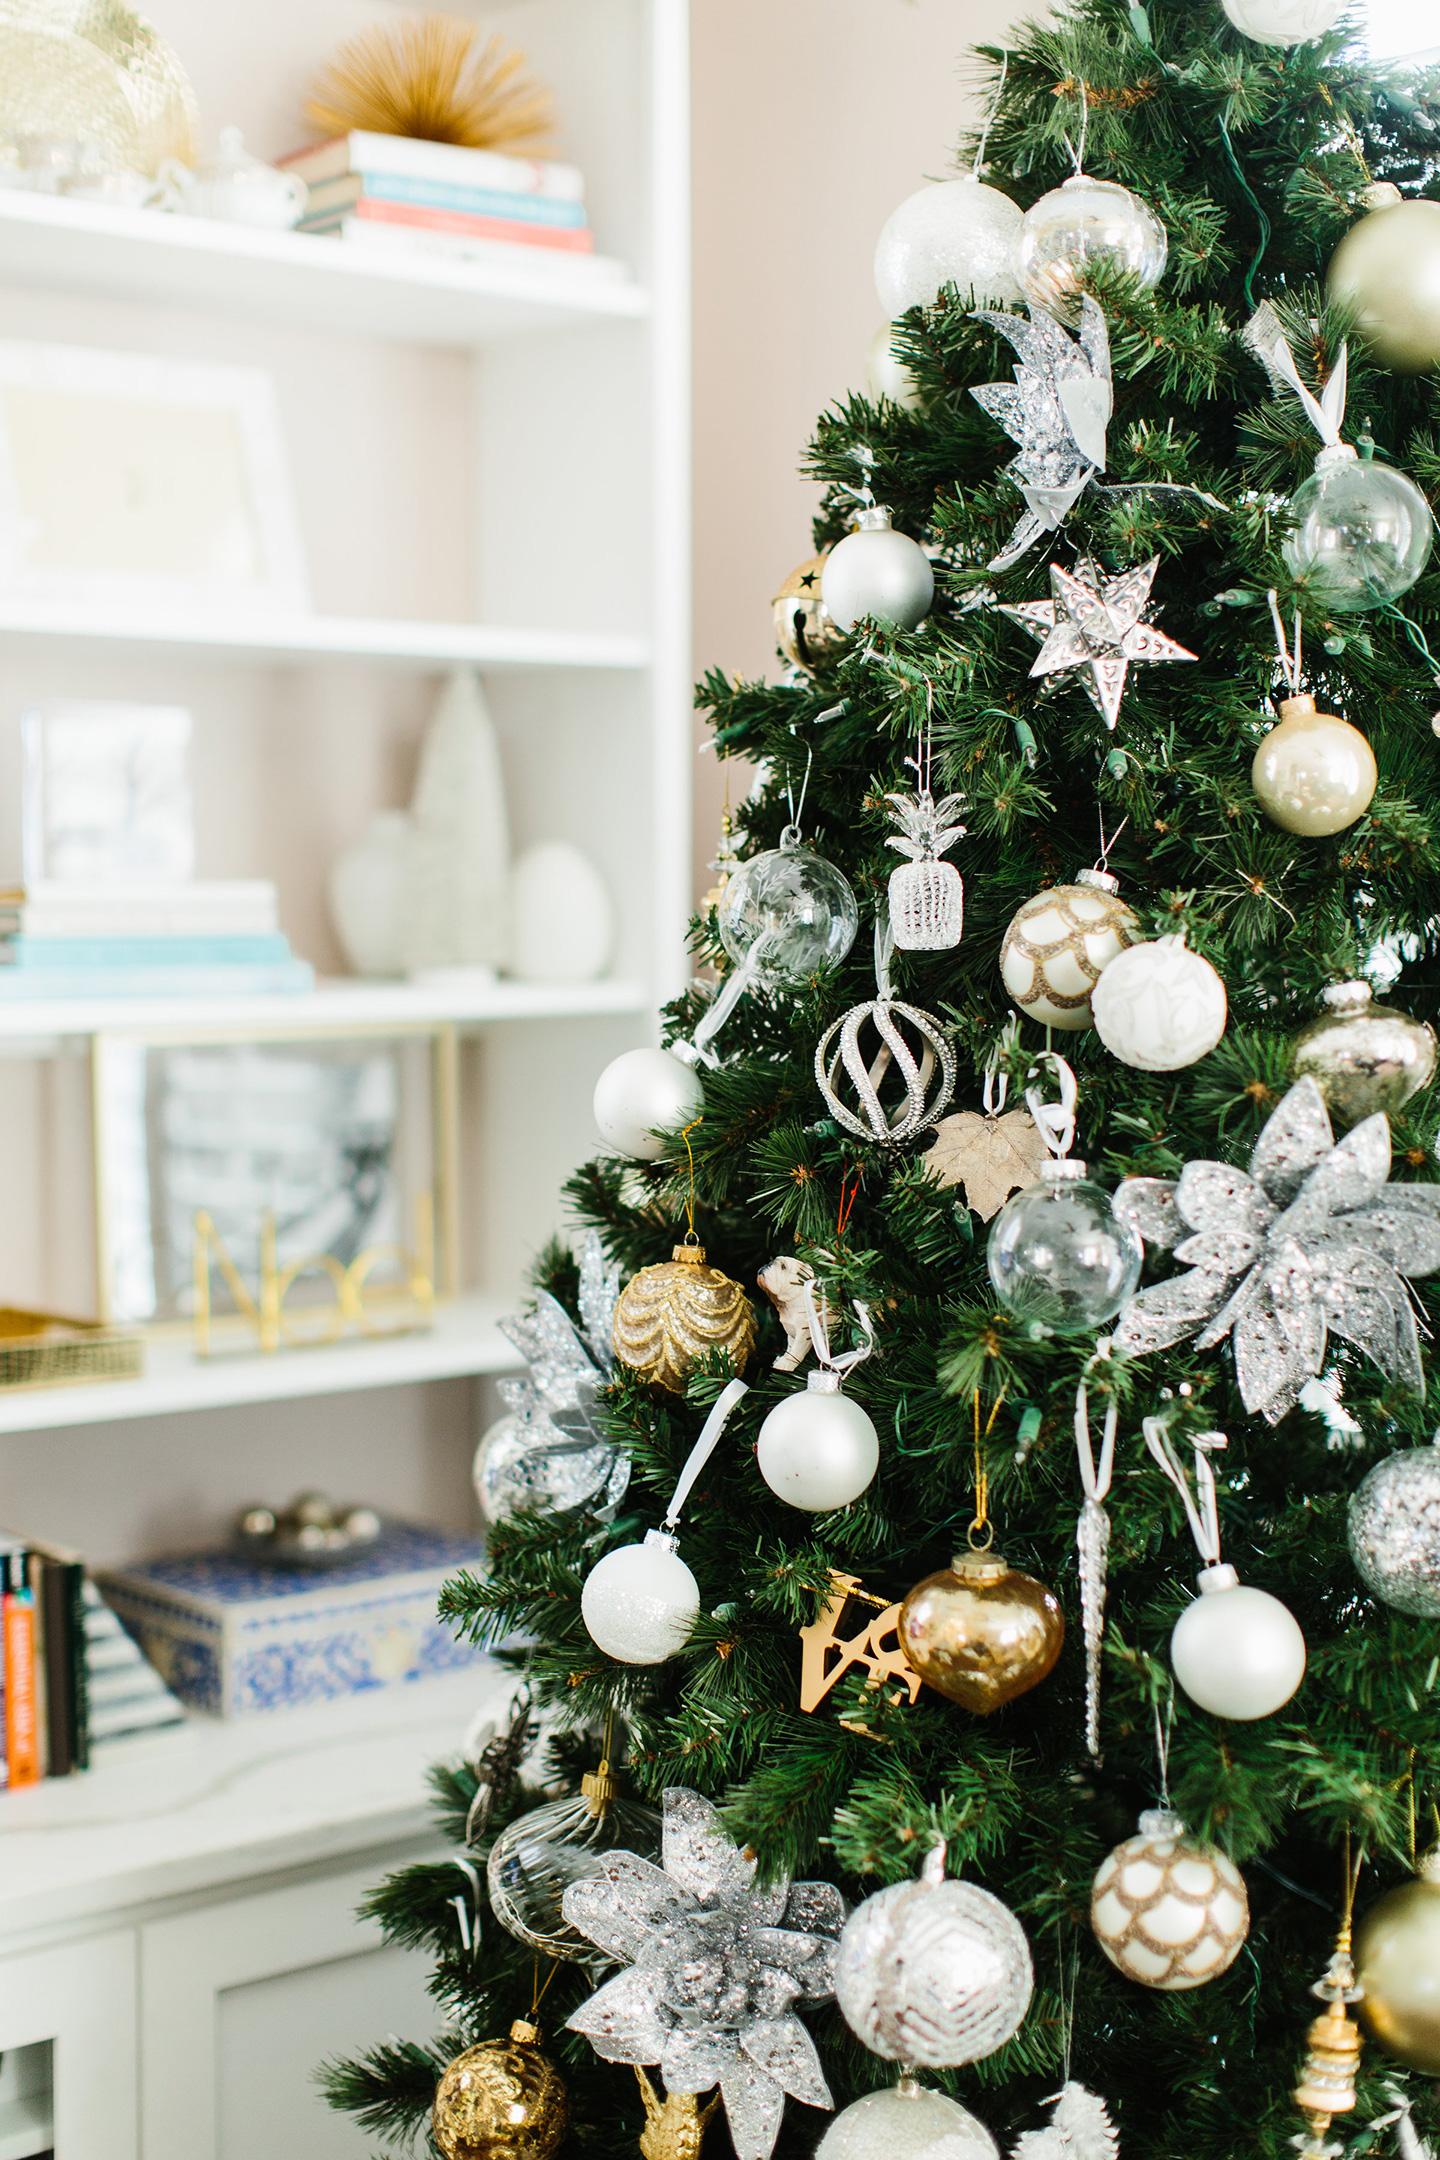 Deck the Halls | Christmas 2017 Charleston Decor